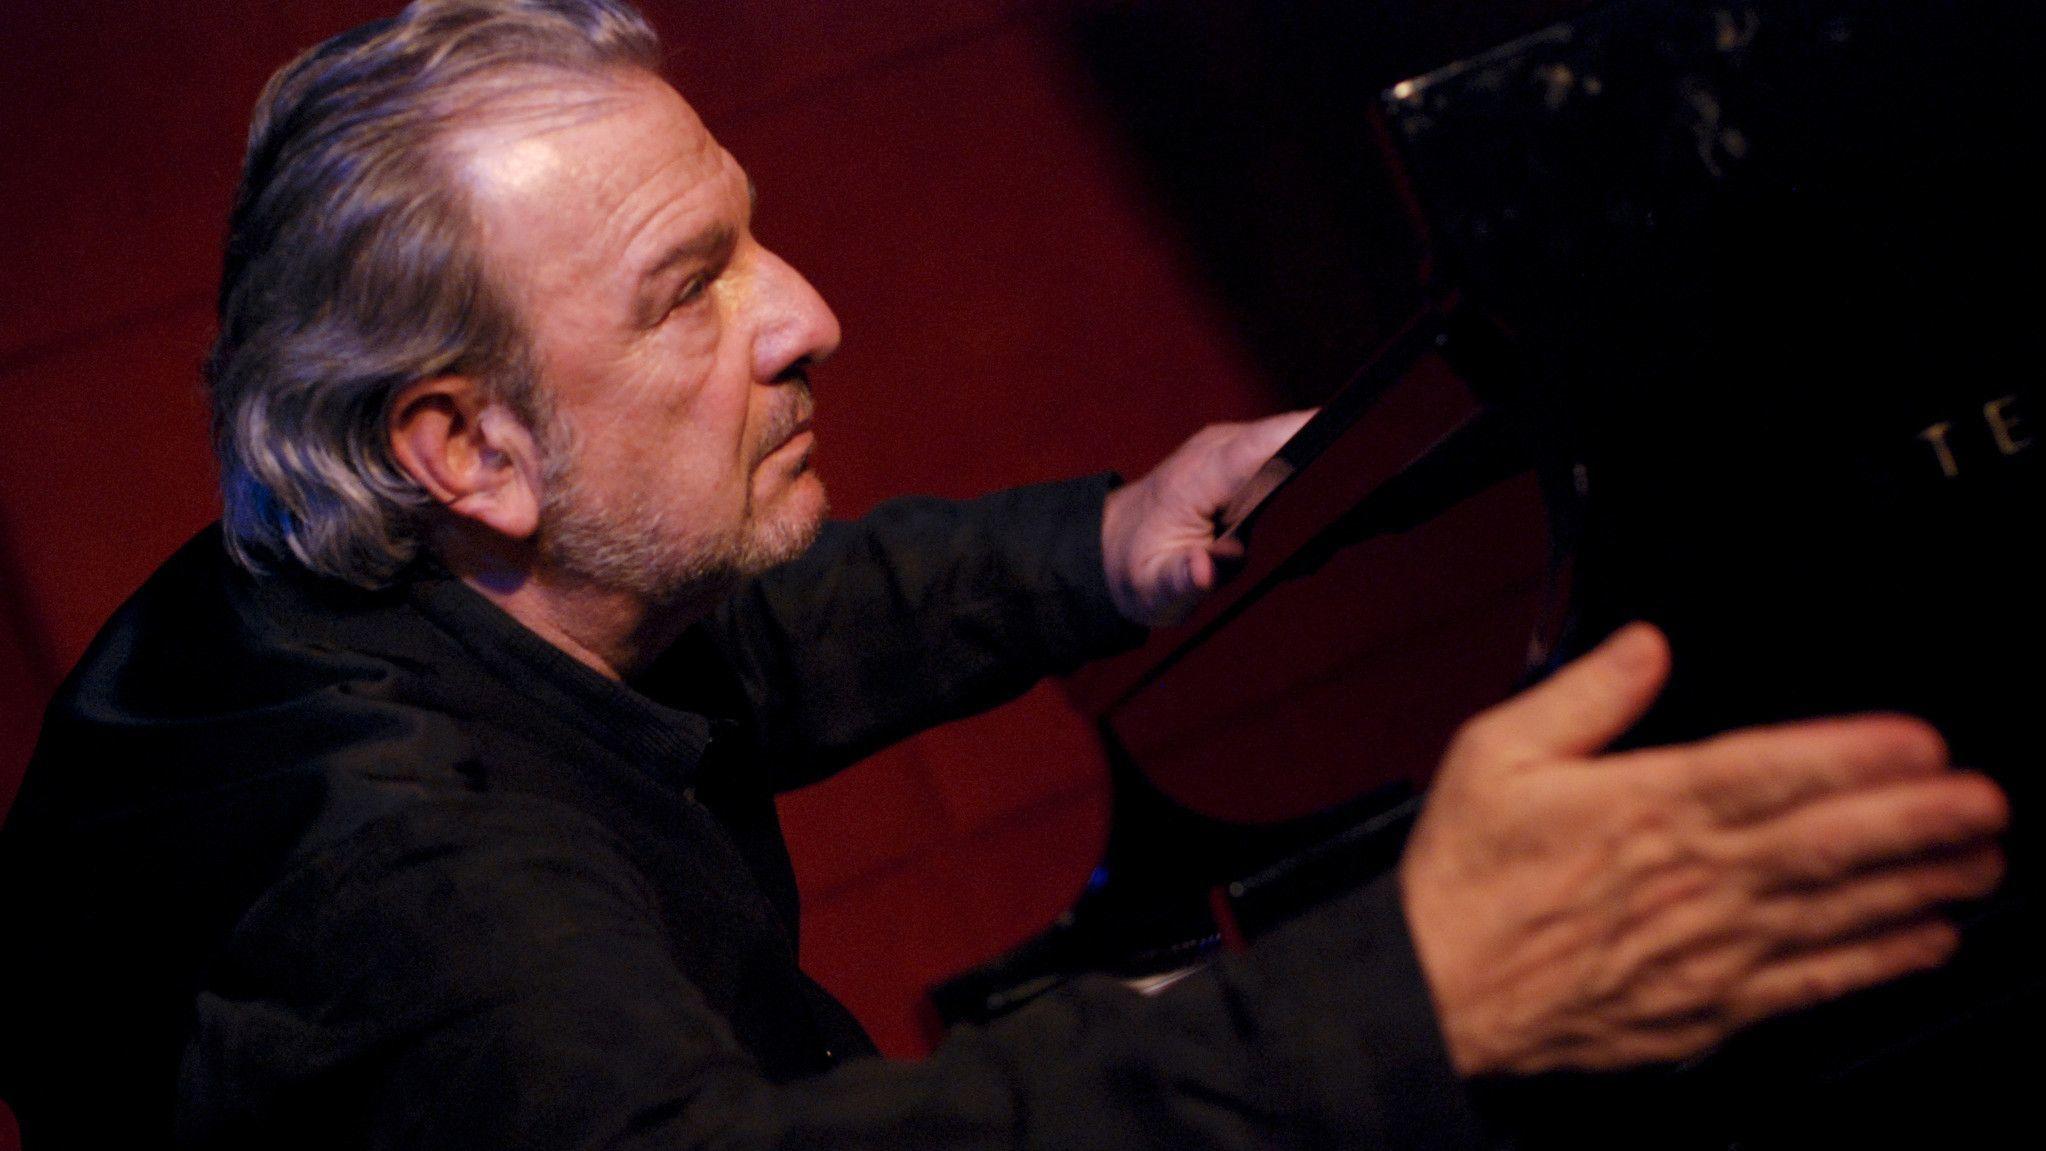 Pablo Ziegler Jazz Tango Trio to perform at La Jolla JCC Thursday